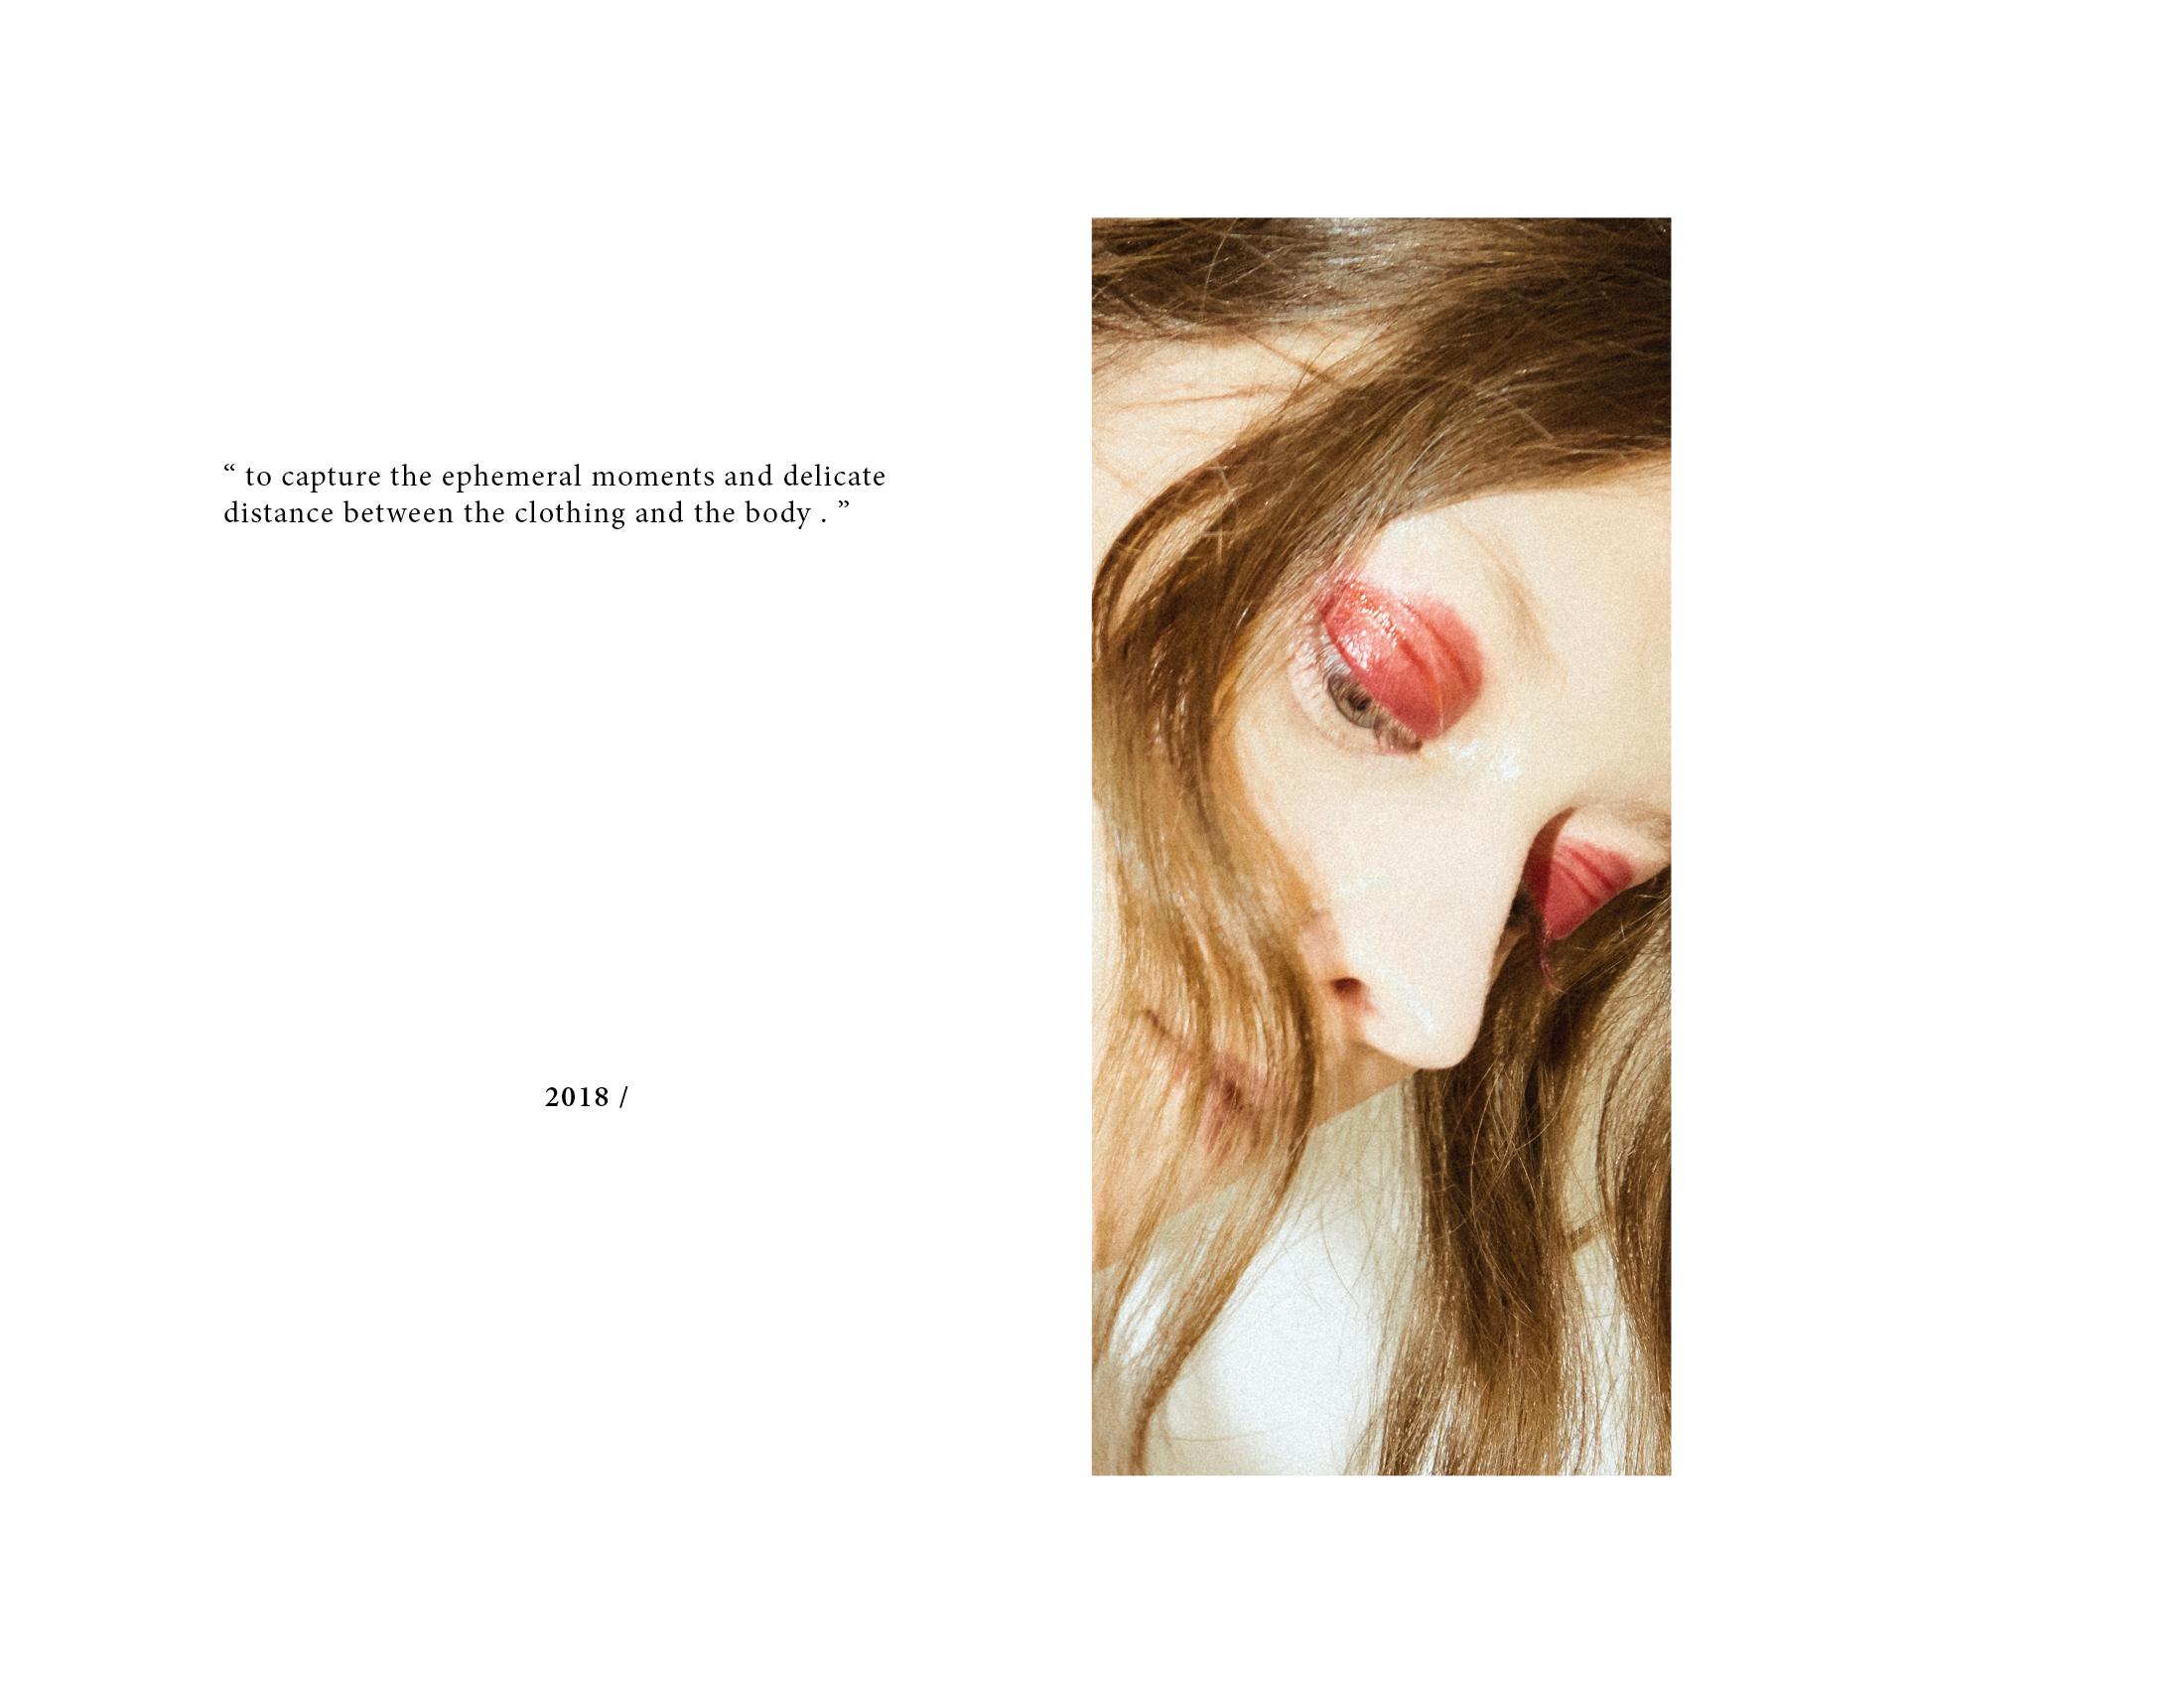 927a76dfefb9-Pan_Jin_lookbook2.jpg